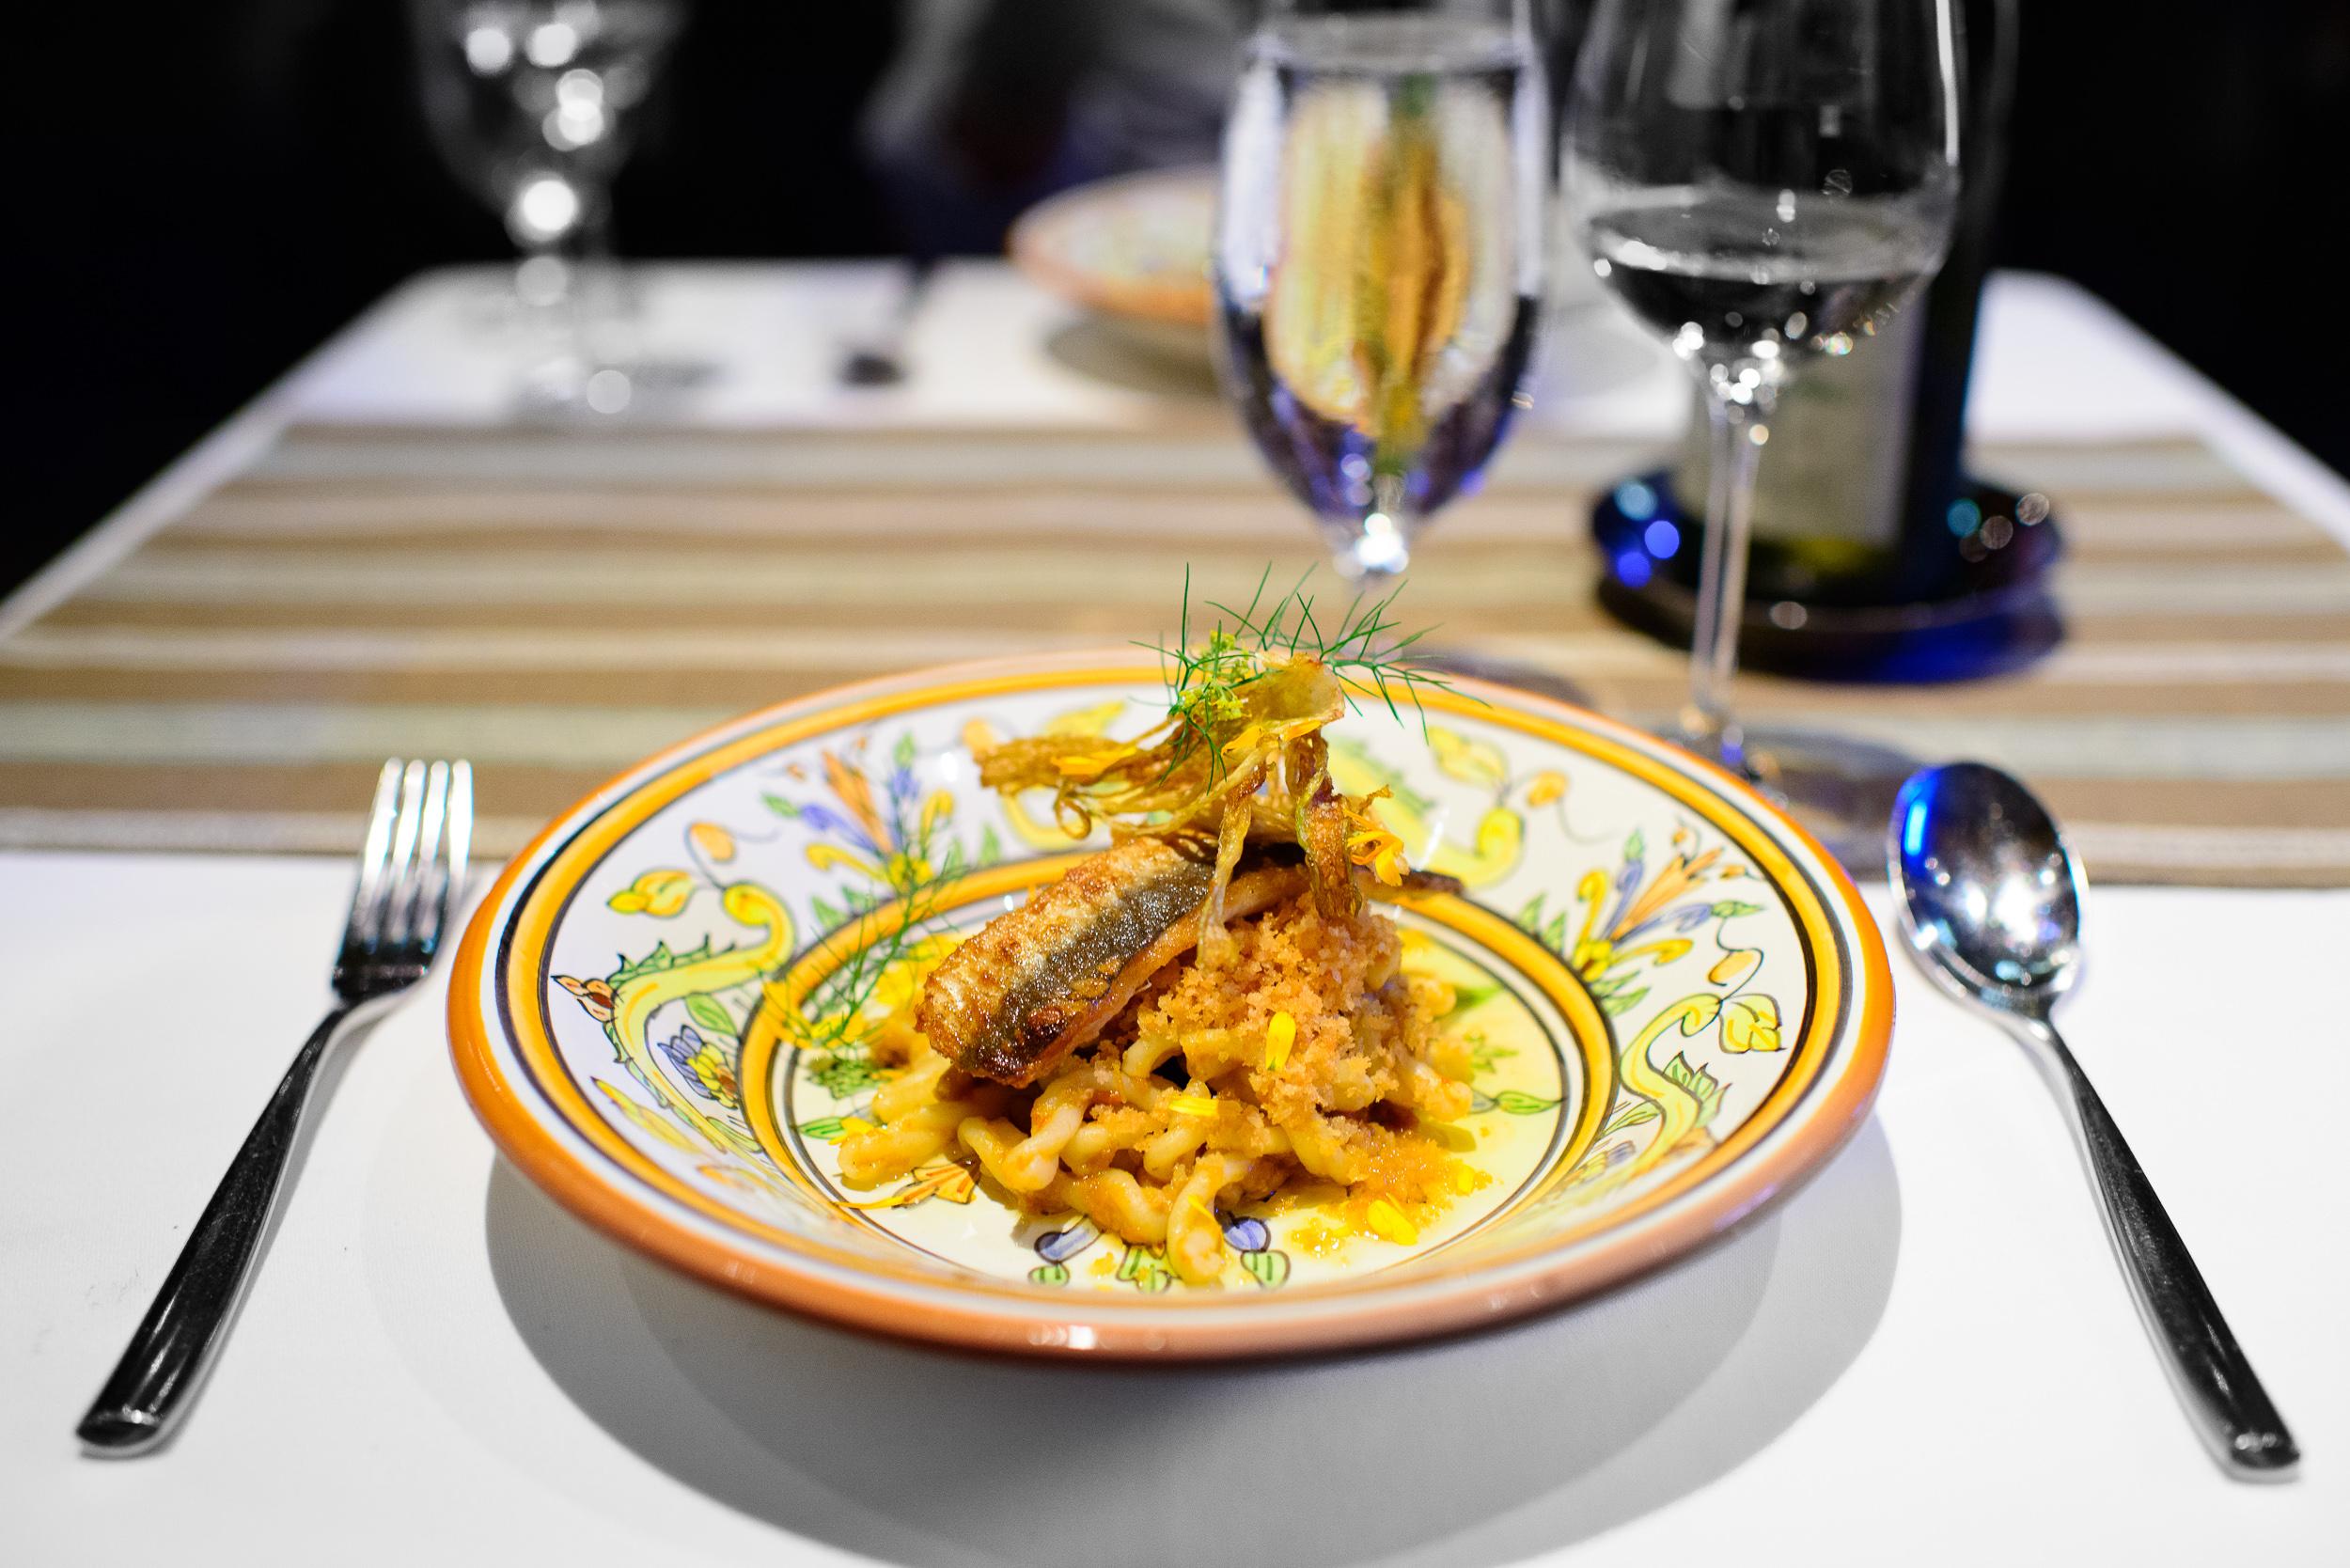 Gemelli con le Sarde (paired pasta twists) / Next: Sicily, Chicago, Illinois, United States